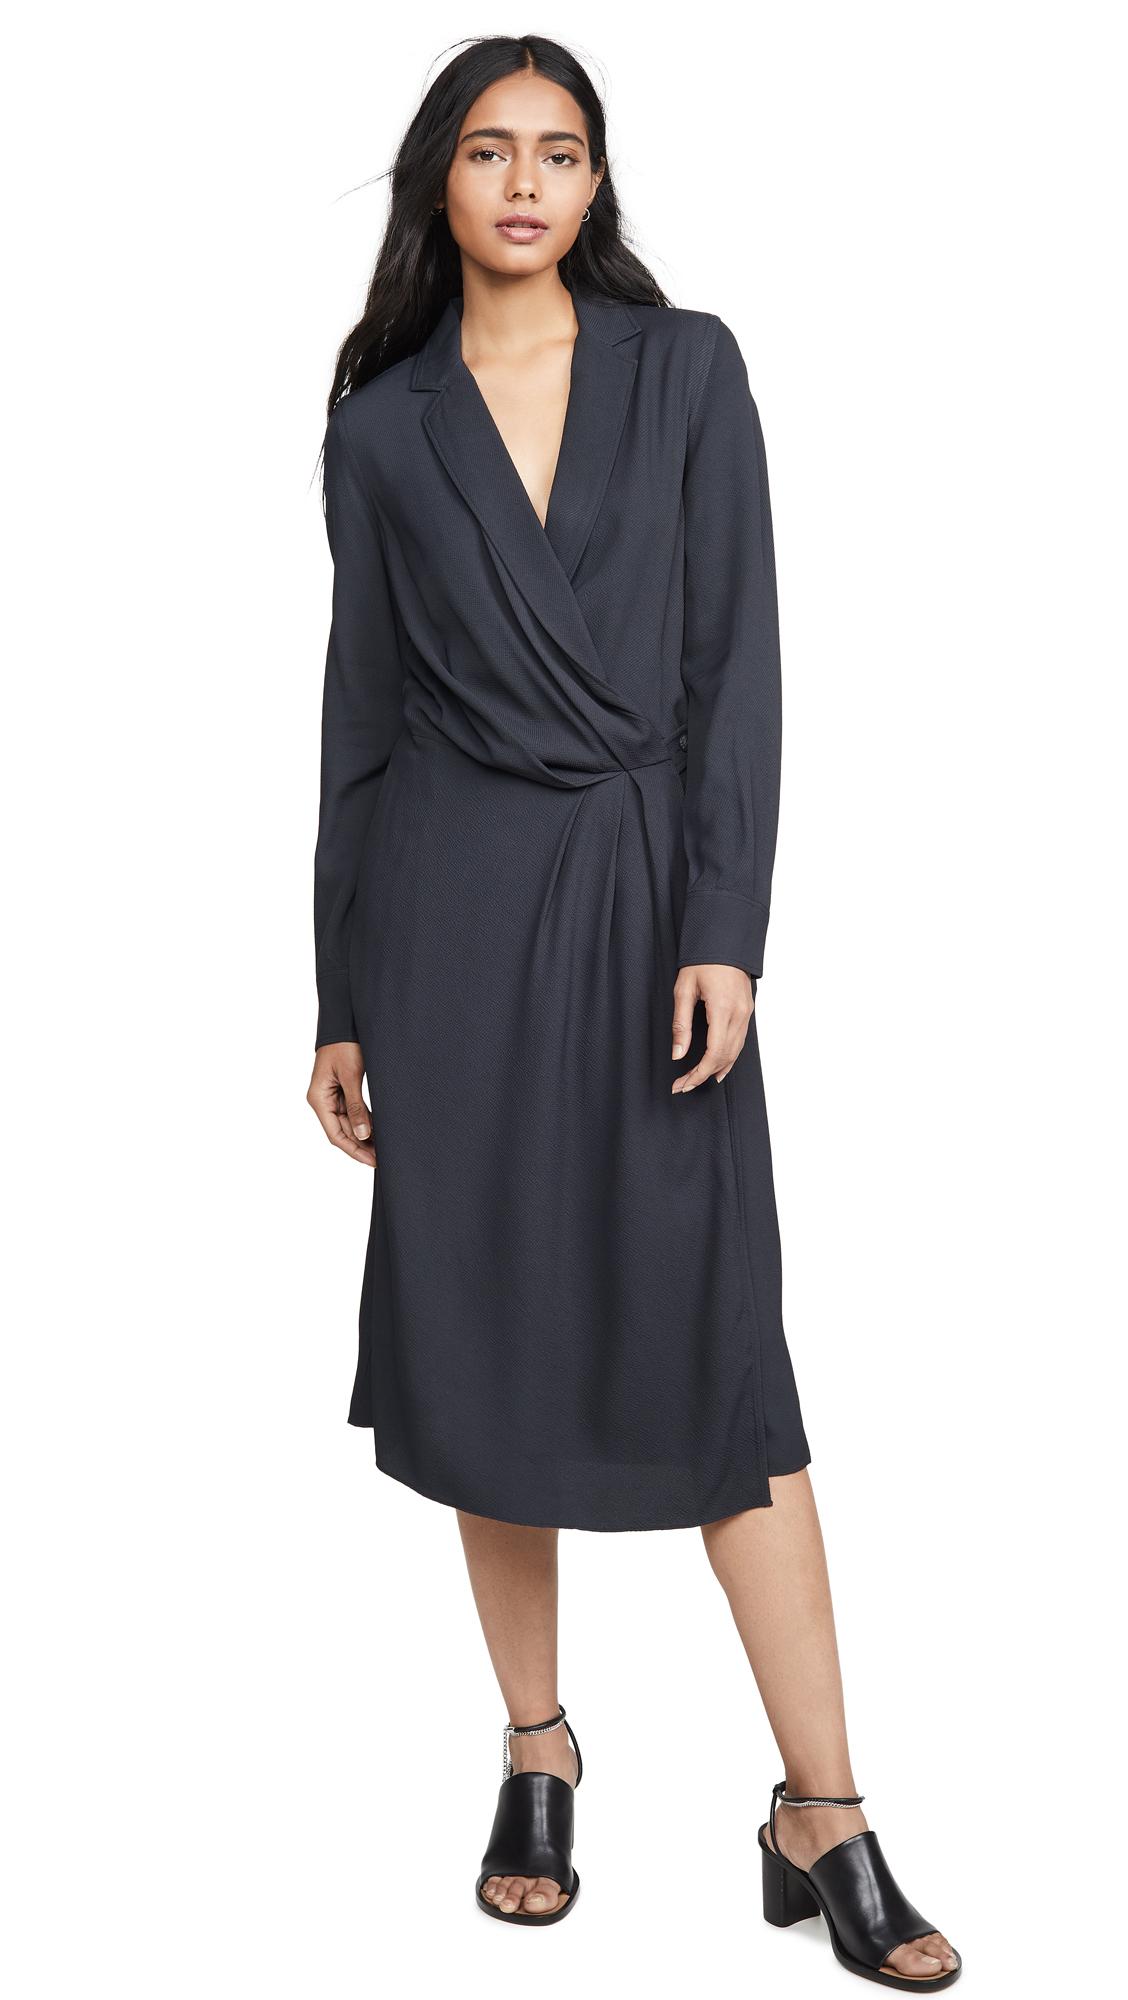 Photo of Rag & Bone Dean Dress - shop Rag & Bone Clothing, Dresses online